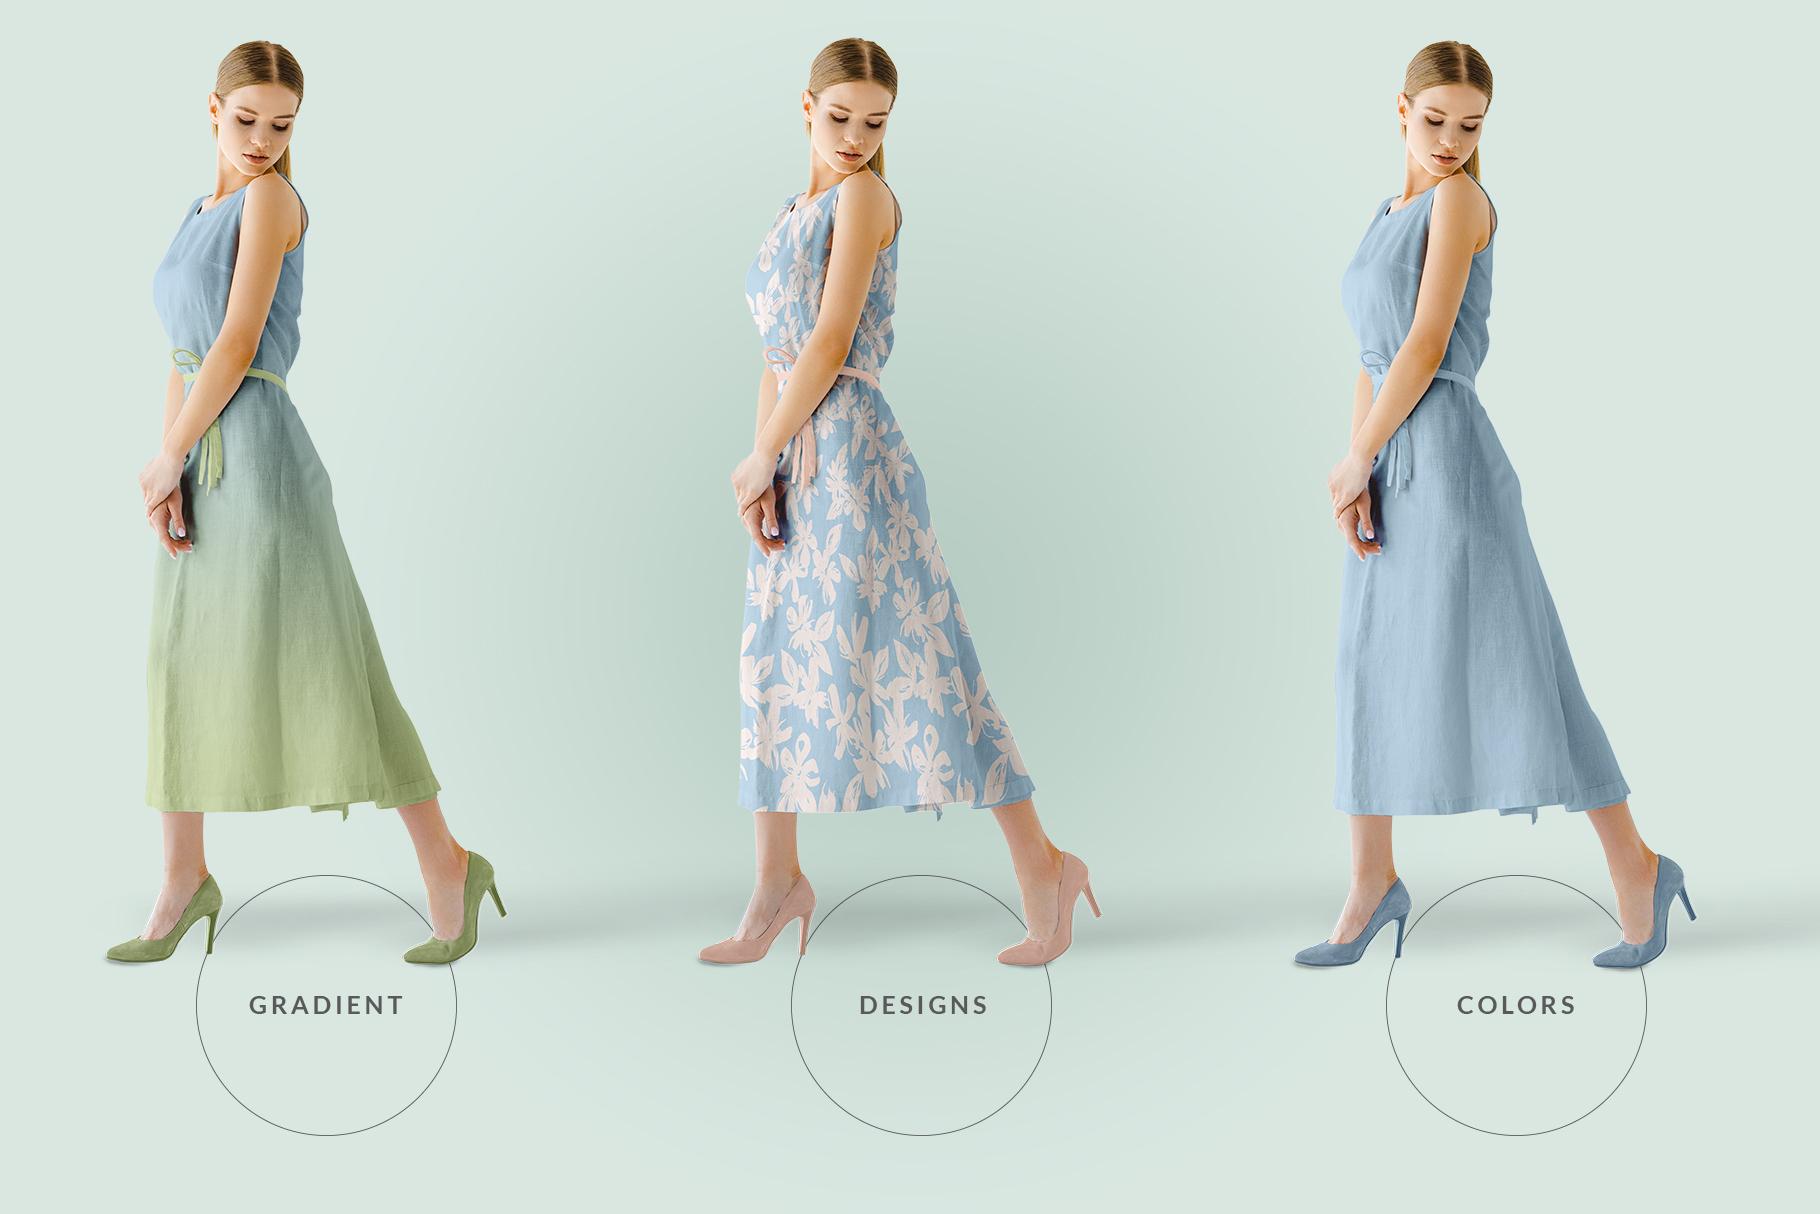 female sleeveless long dress mockup image preview 7